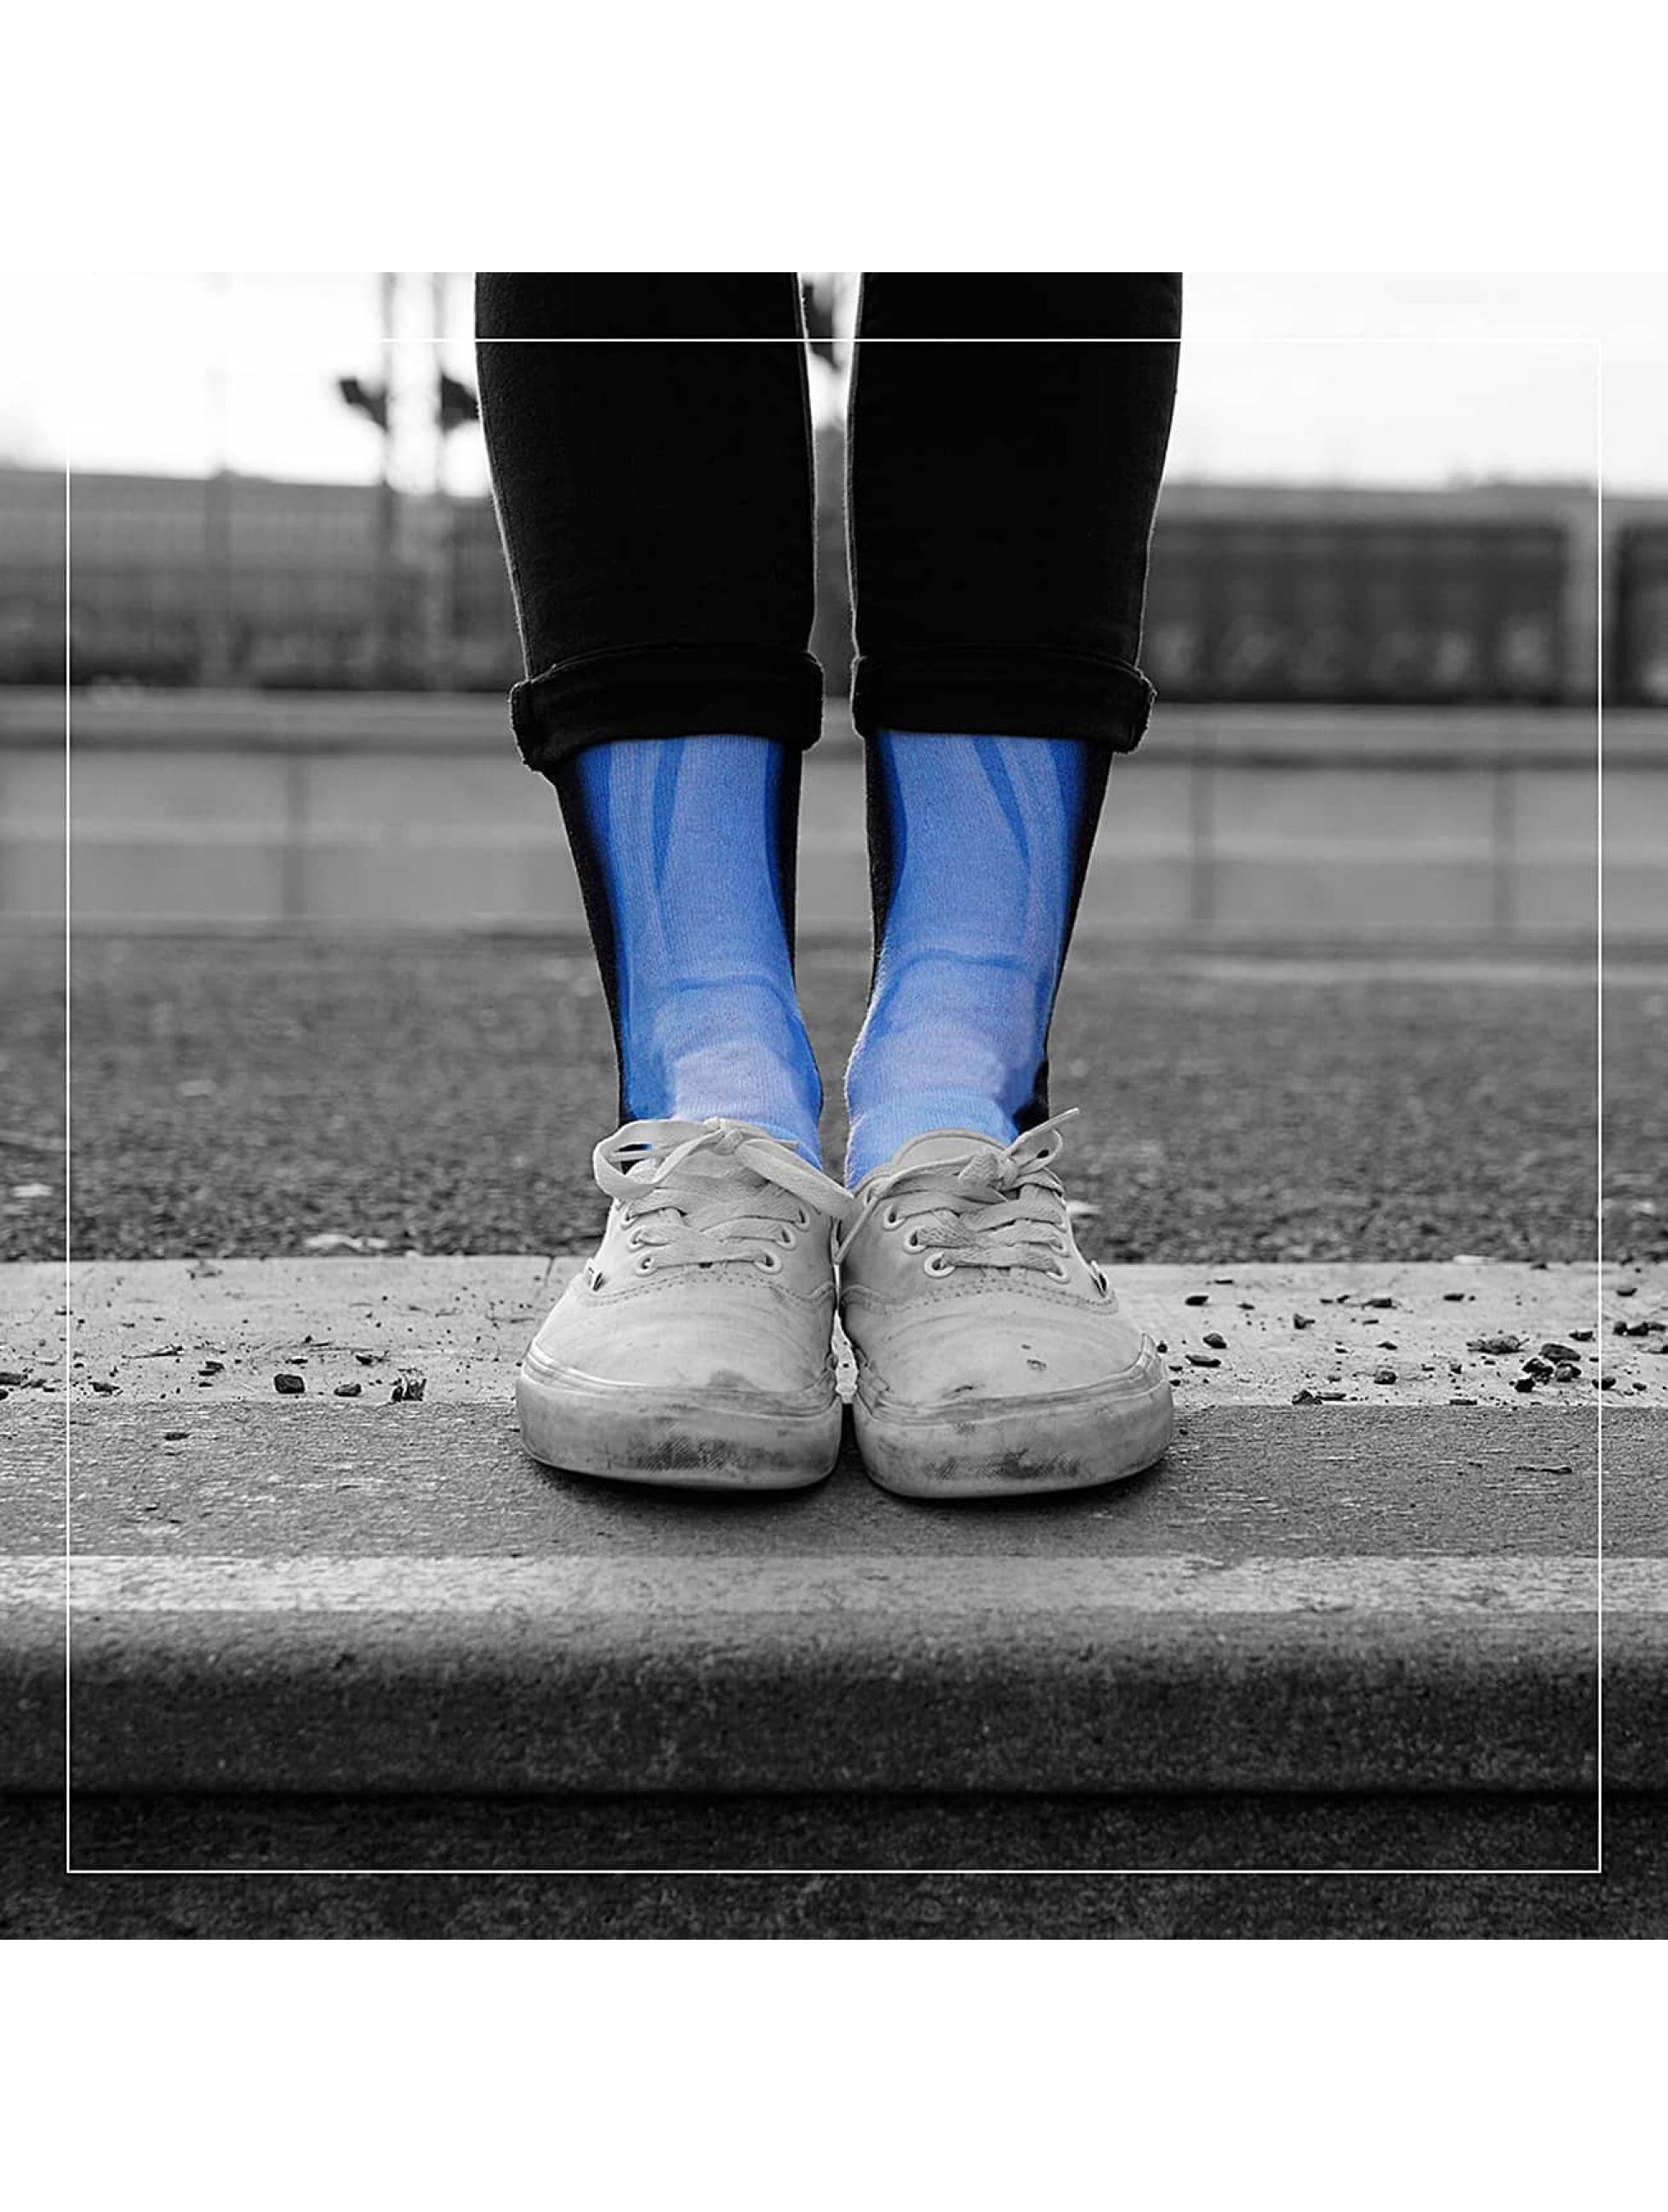 LUF SOX Männer,Frauen Socken X-Ray in schwarz